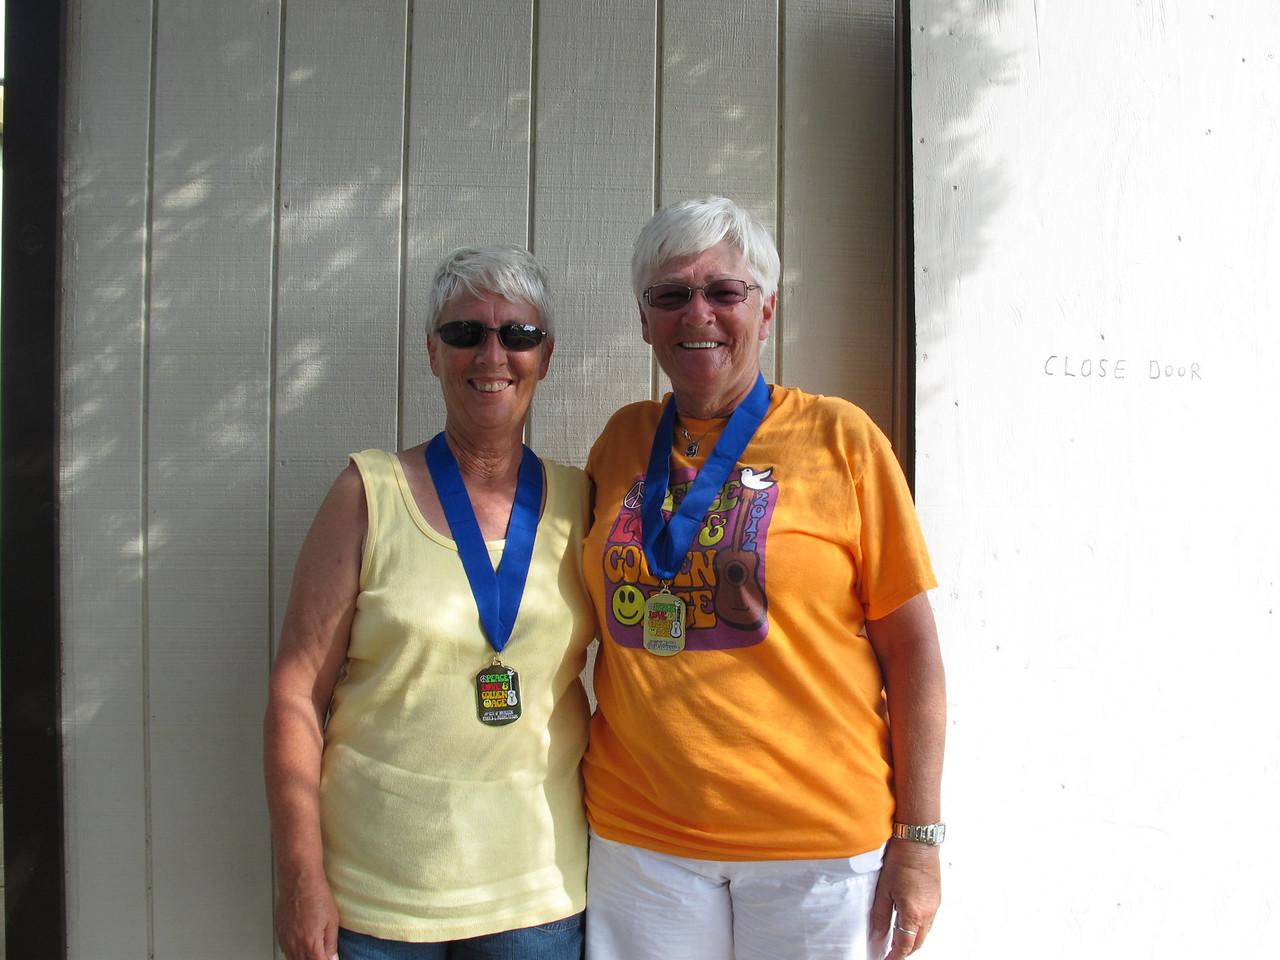 Shuffleboard Women's Doubles Expert 1st Place - Lynda King (Snow to Sun) & Noreen Coates (Pine to Palm)